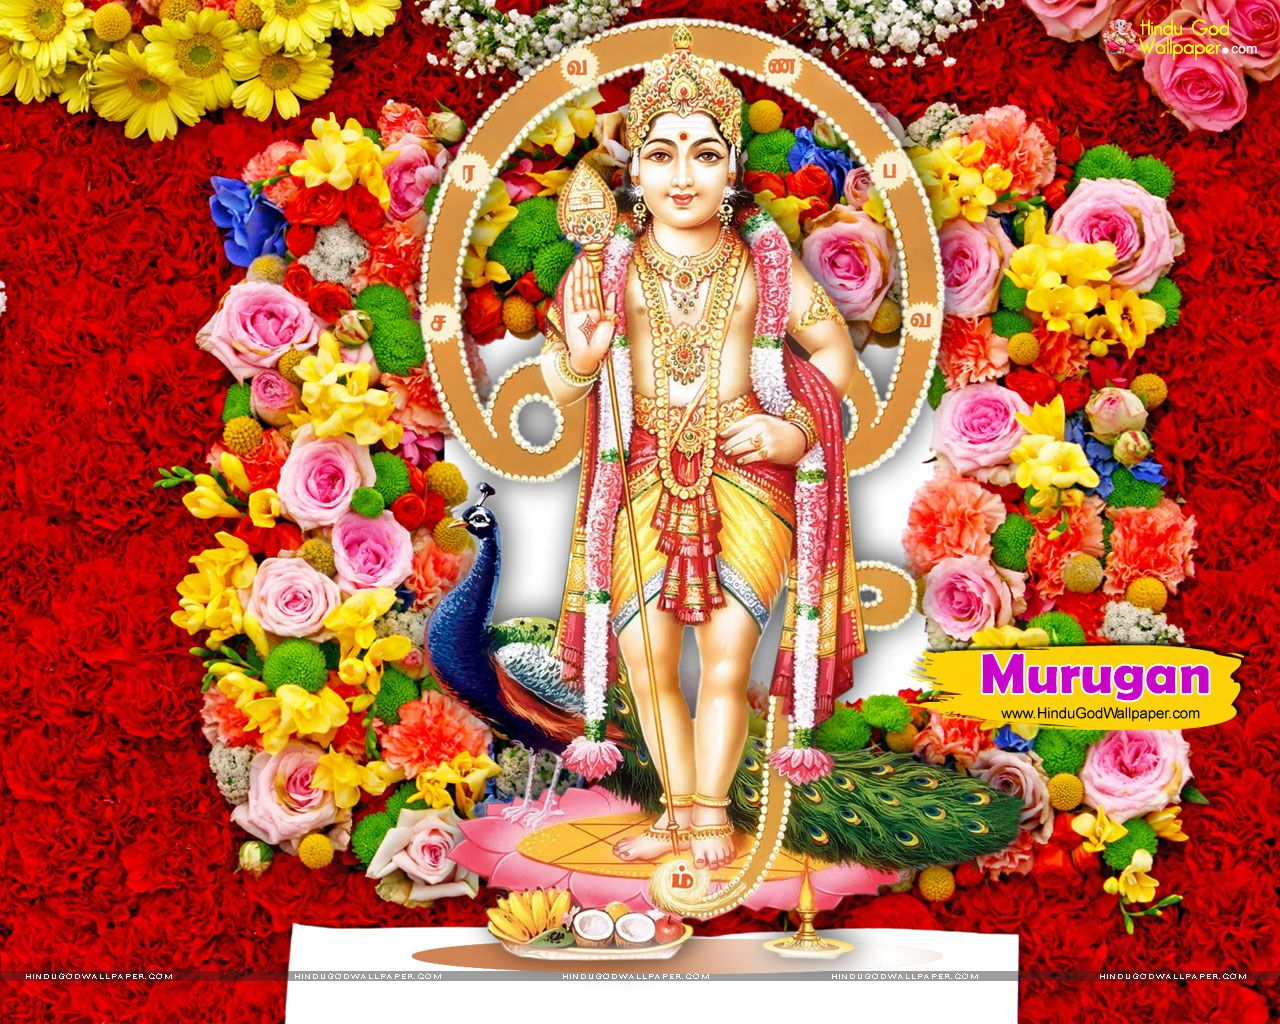 Http Www Hindugodwallpaper Com Images Gods Zoom 2357 Murugan Wallpaper 07 Jpg Lord Murugan Wallpapers Lord Murugan Lord Krishna Hd Wallpaper